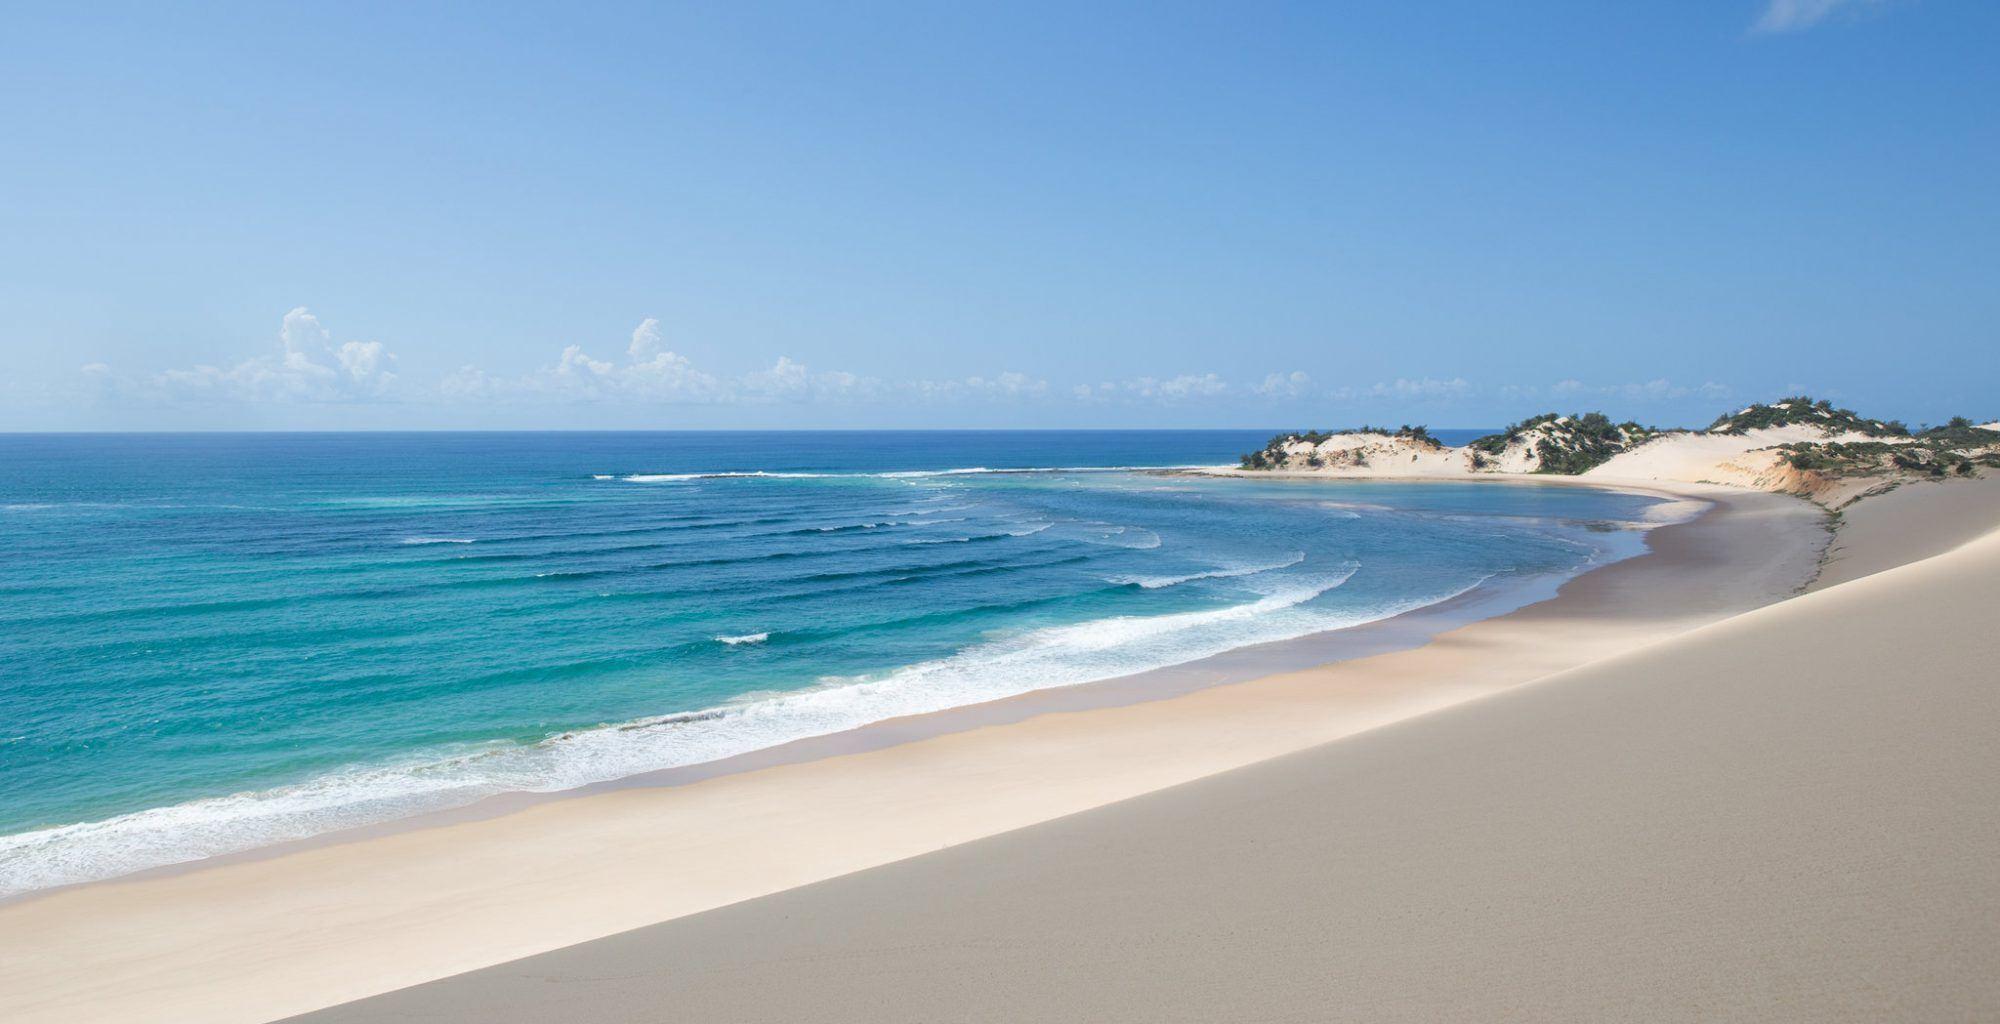 Mozambique-Bazaruto-Archipelago-Beach